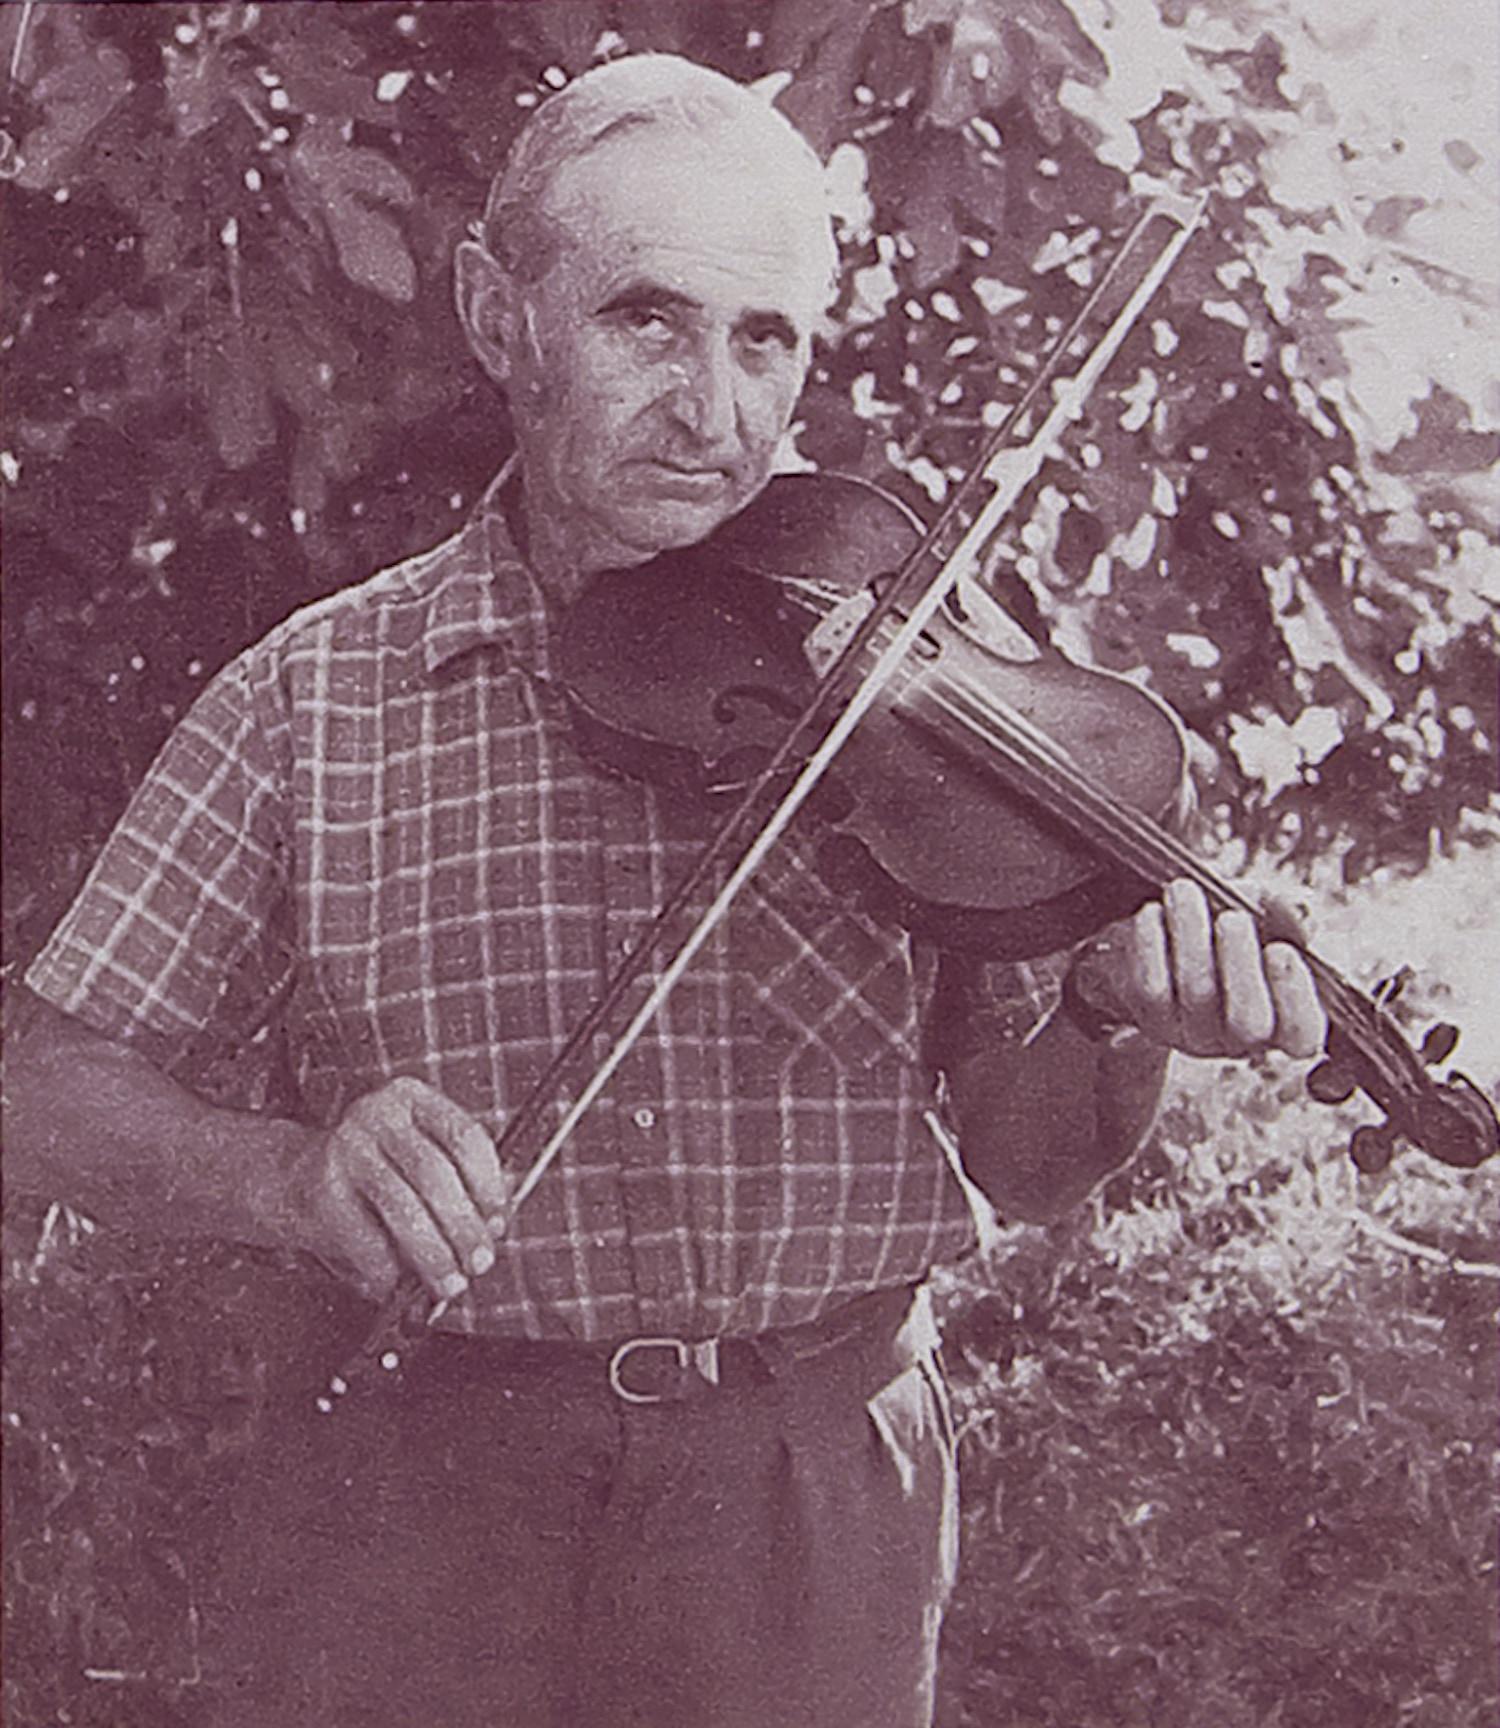 Gaston POUGET